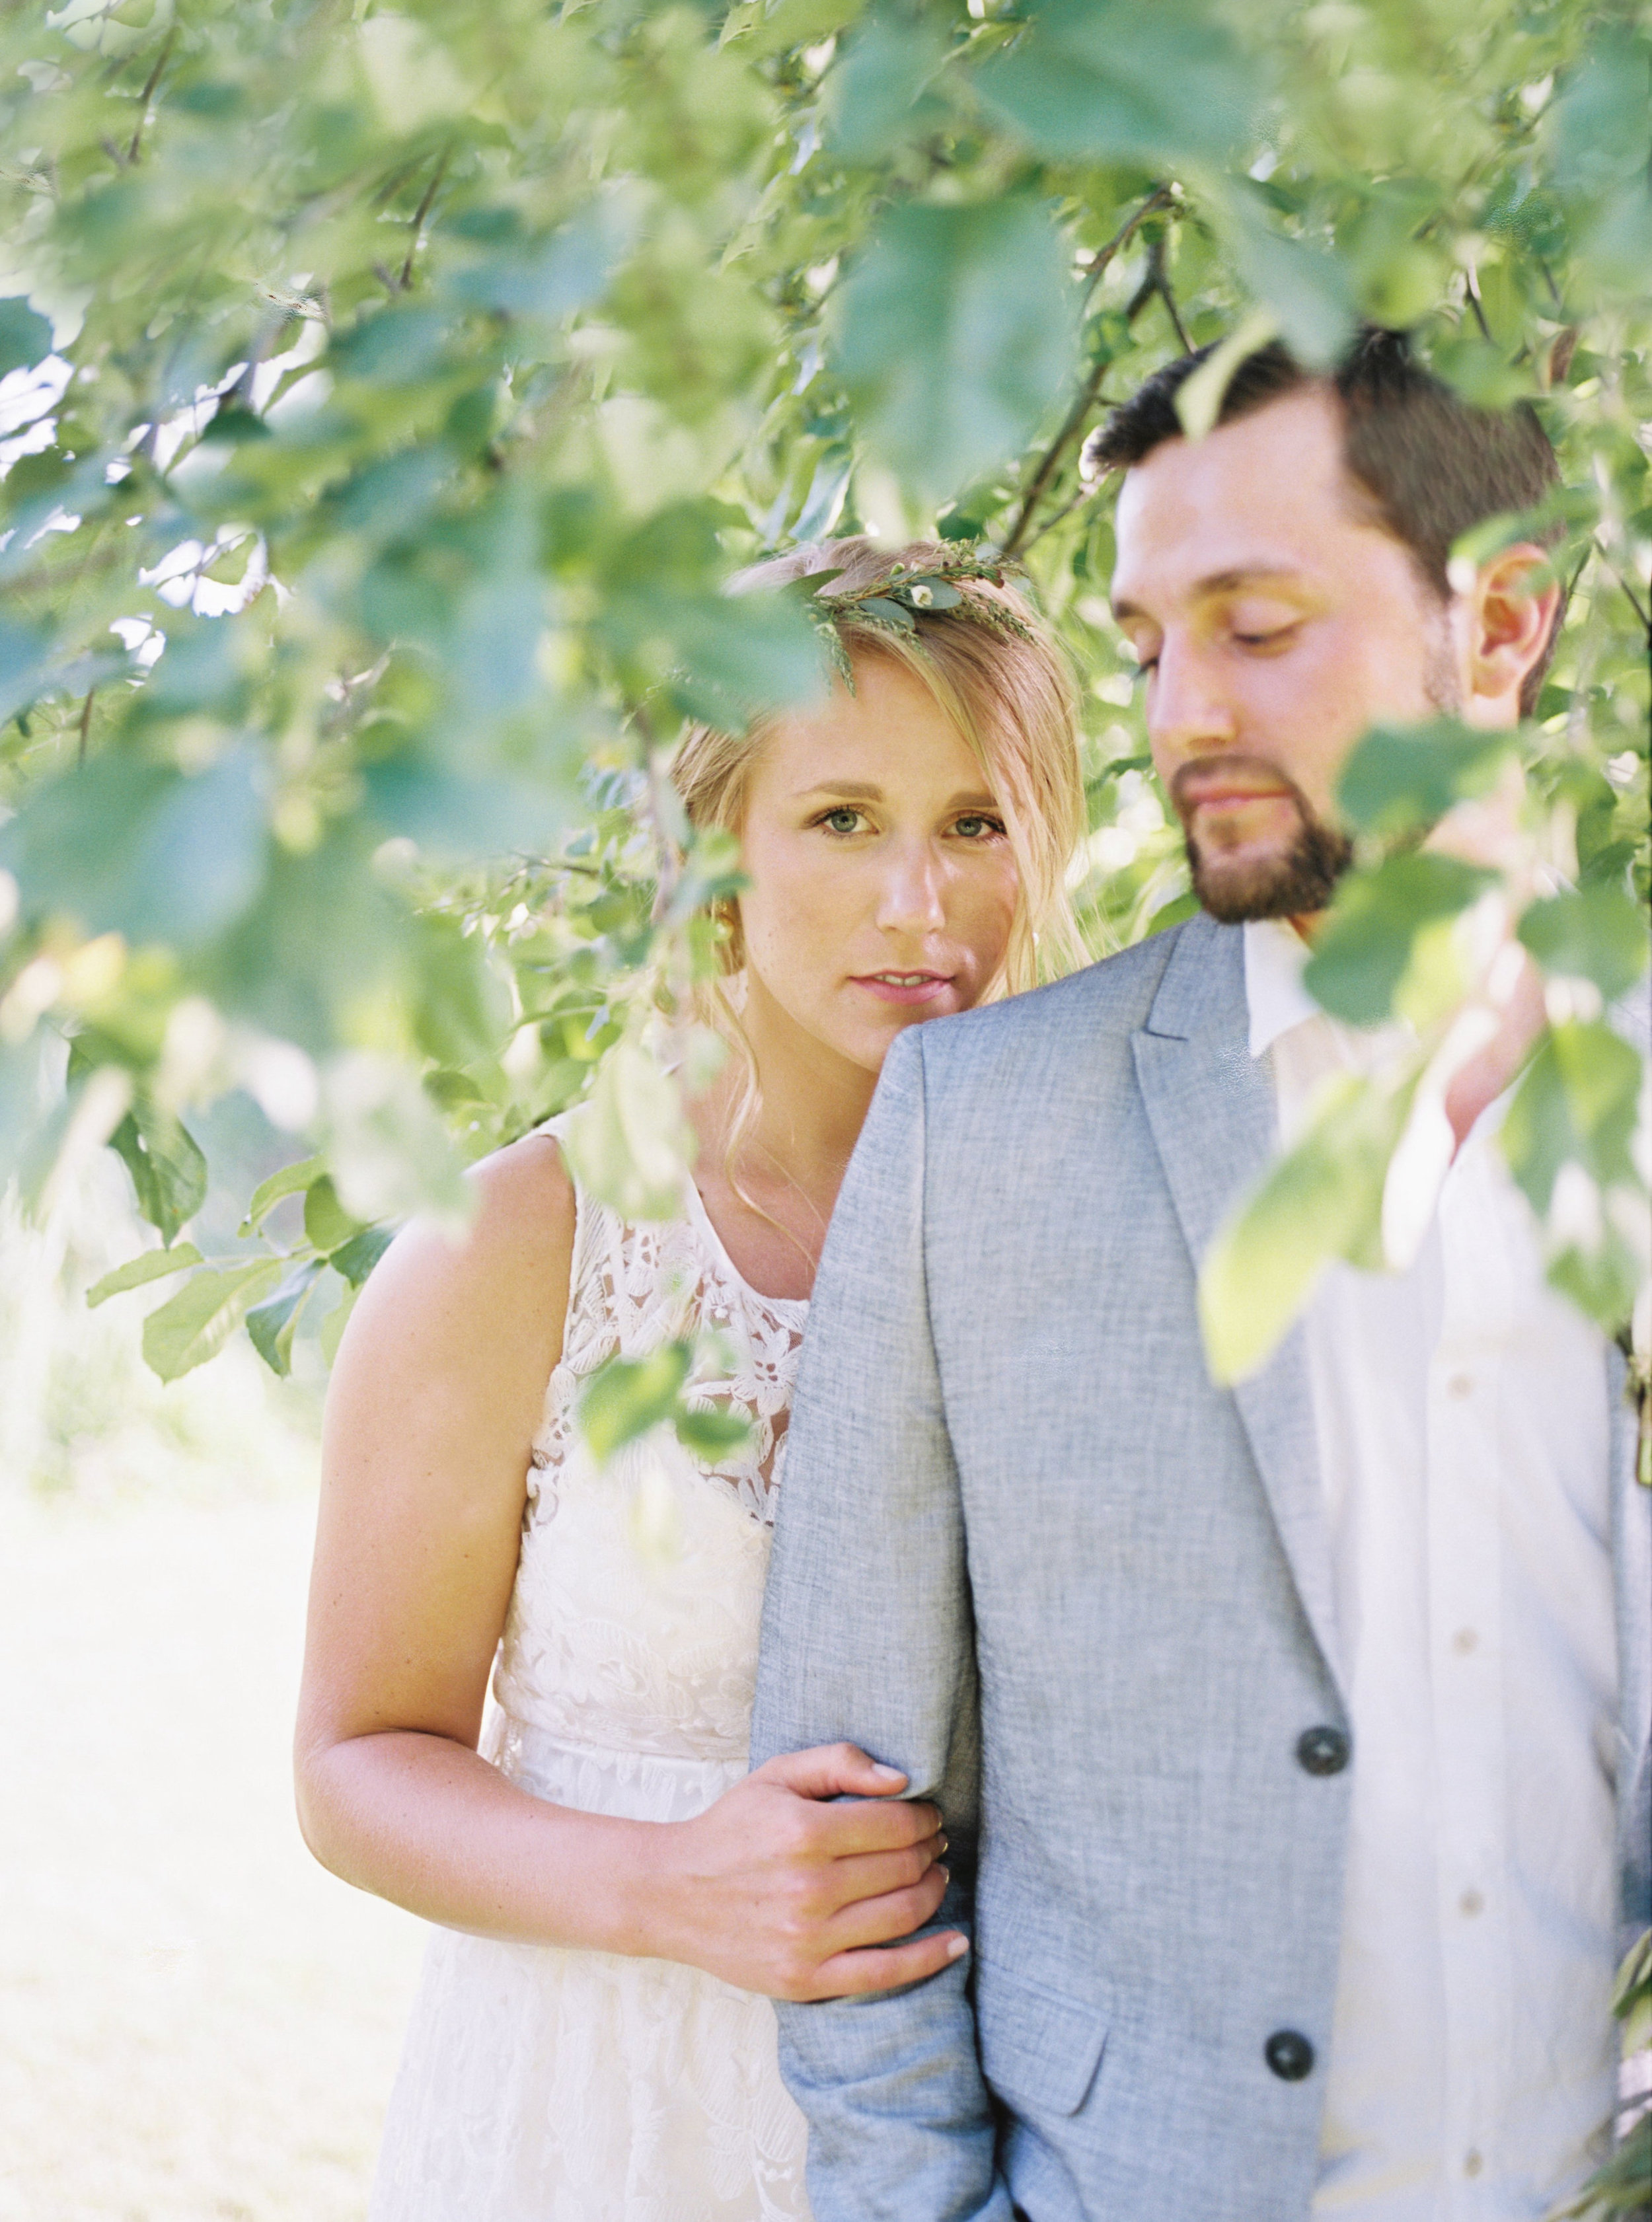 greenhouse-wedding-inspiration-by-laurelyn-savannah-photography-11.jpg